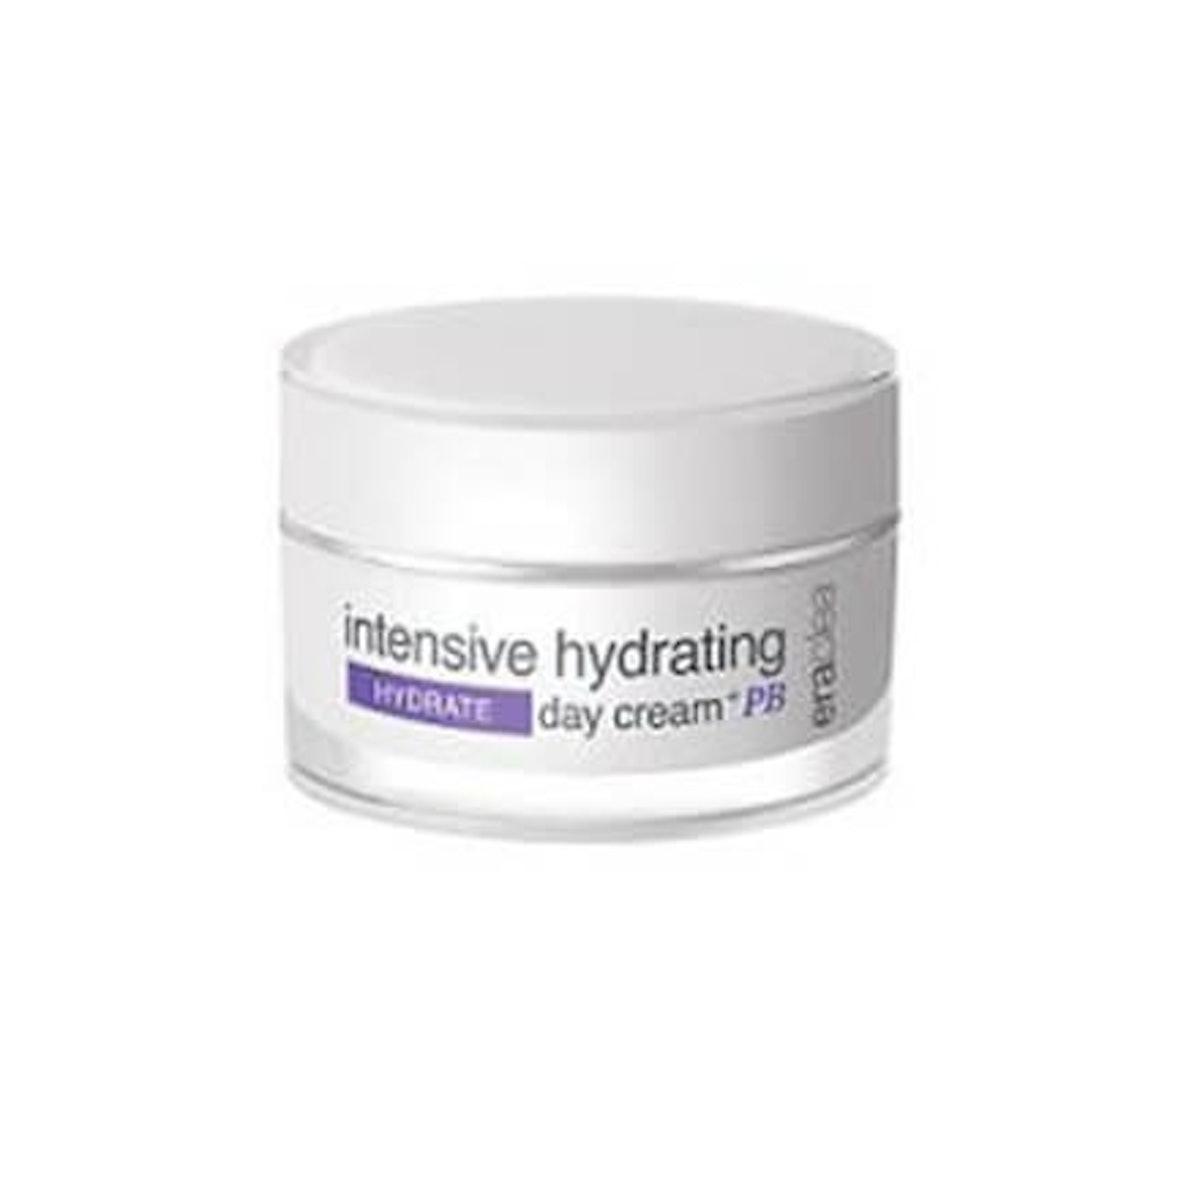 Intensive Hydrating Day Cream + PB